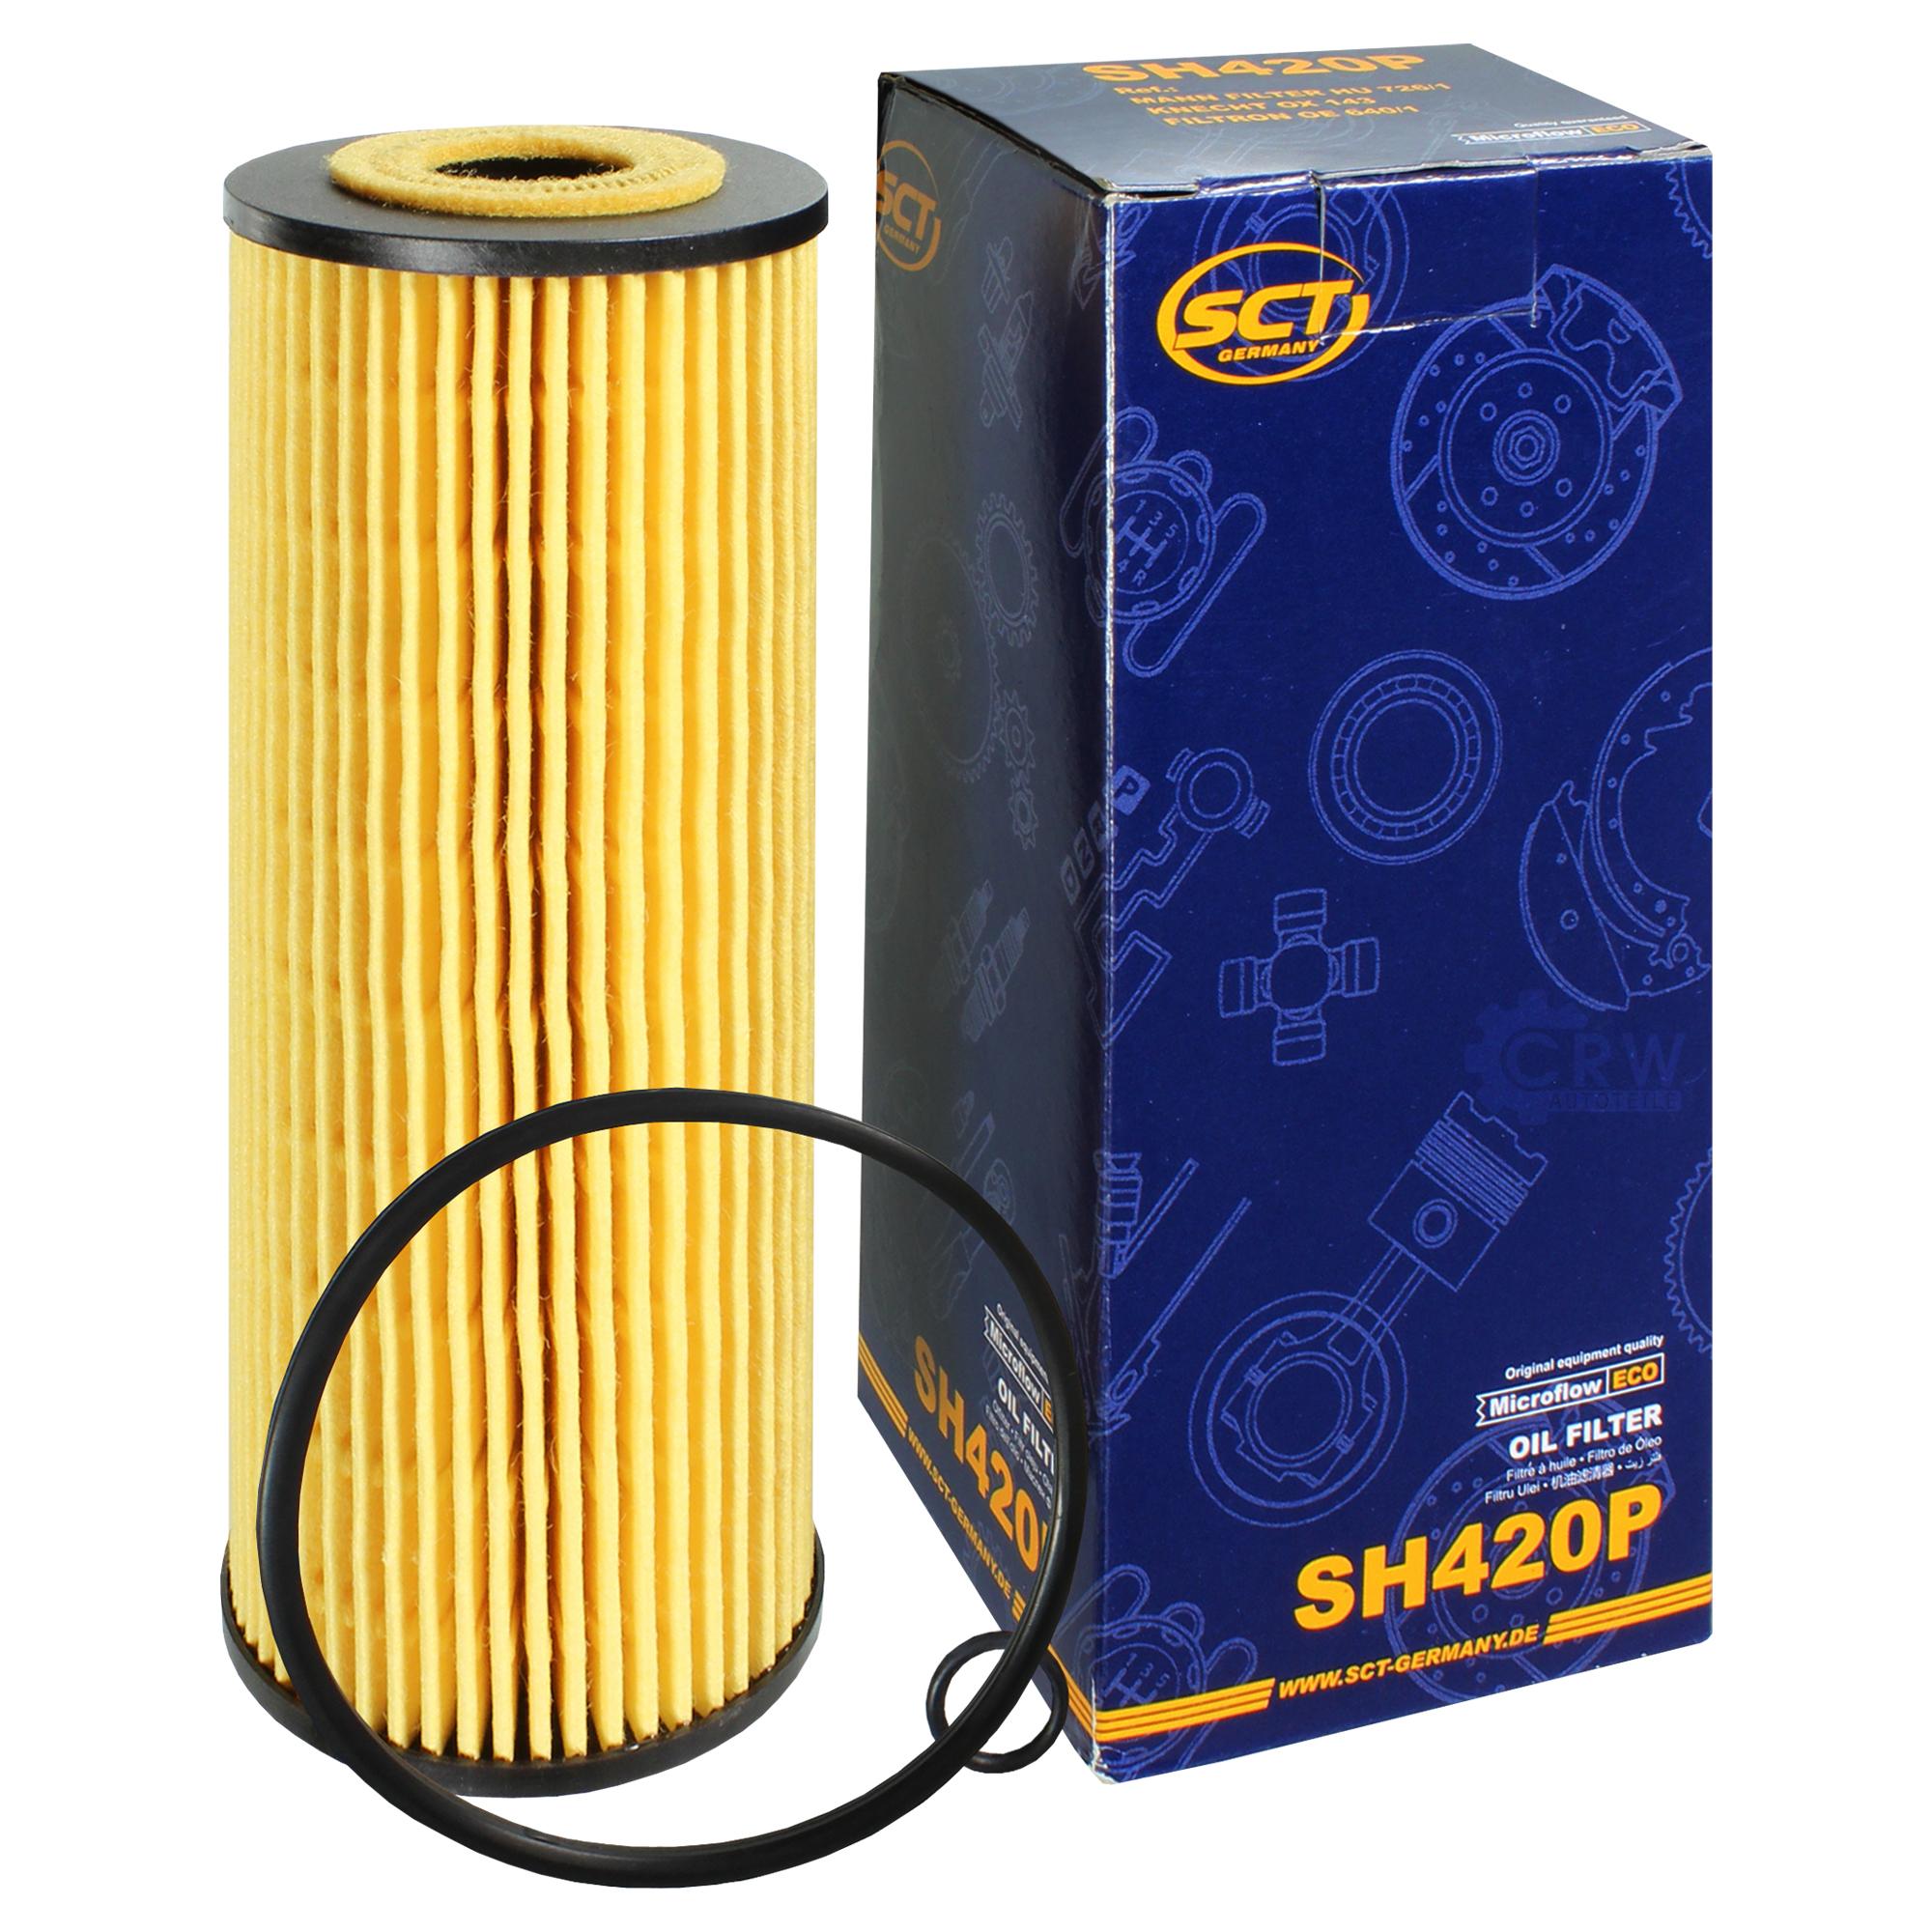 Cambio-de-aceite-set-5l-MANNOL-energy-premium-5w-30-sct-filtro-aceite-Service-10164411 miniatura 2